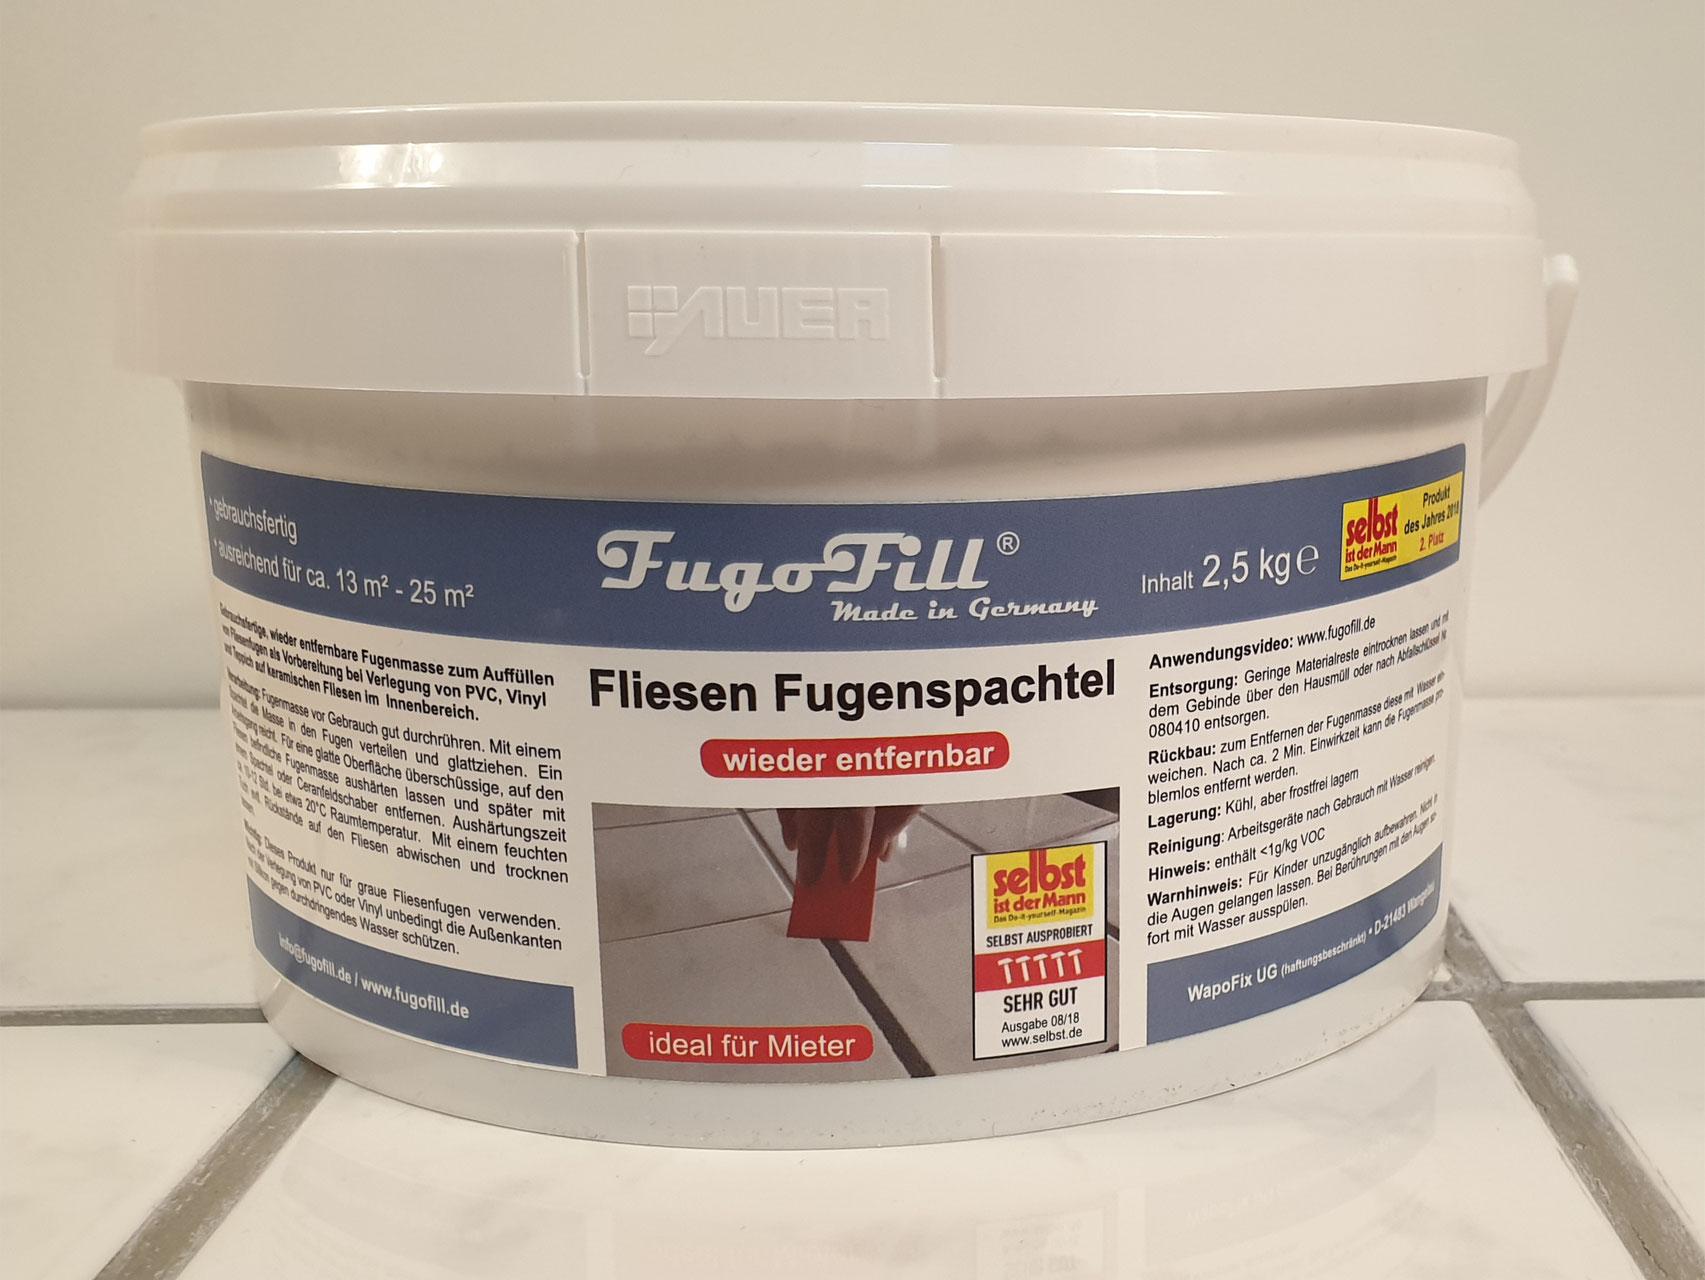 FugoFill Shop FugoFill Fliesen Fugenspachtel kein